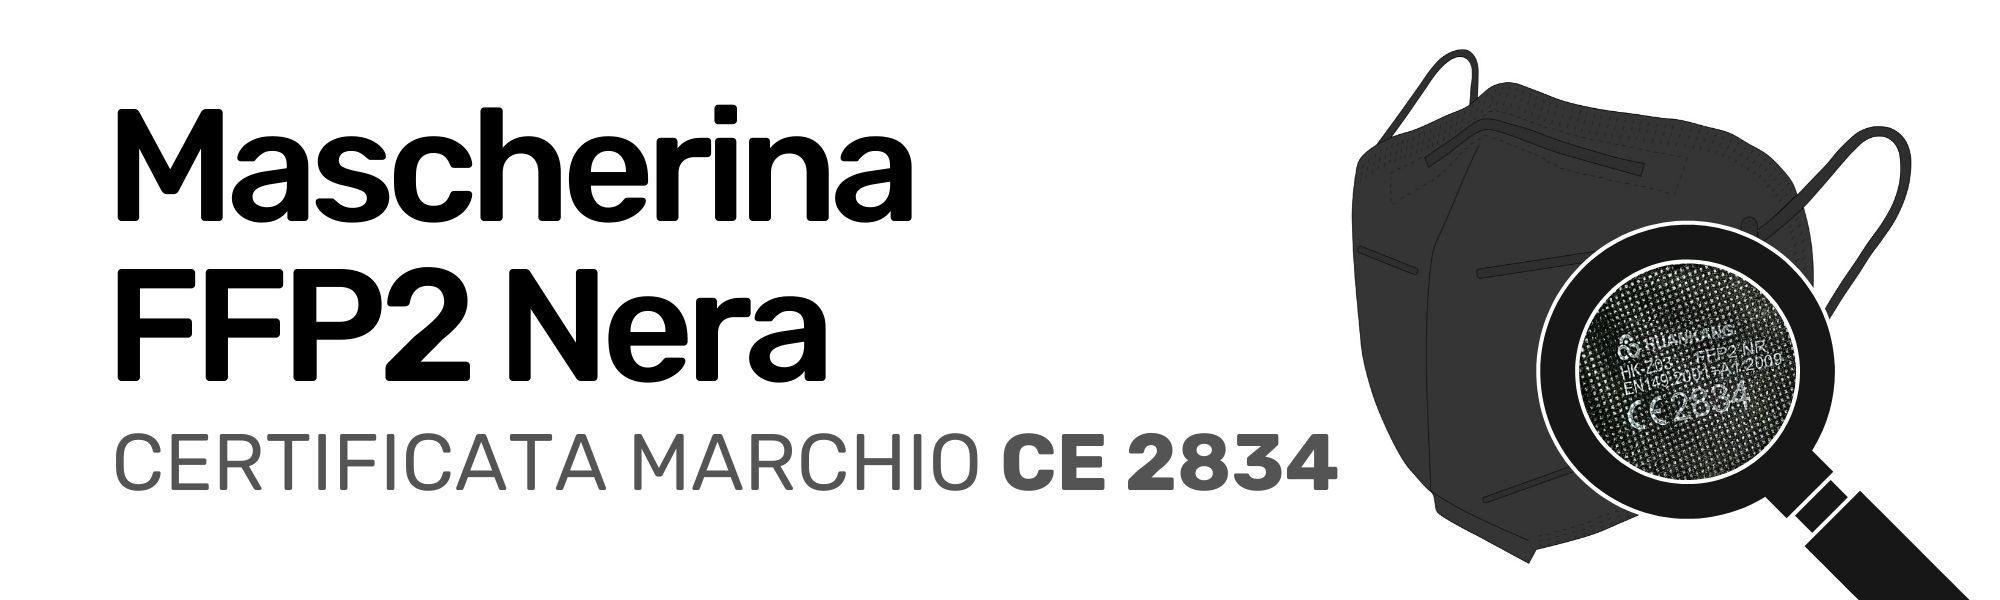 Mascherina FFP2 Certificata CE 2834